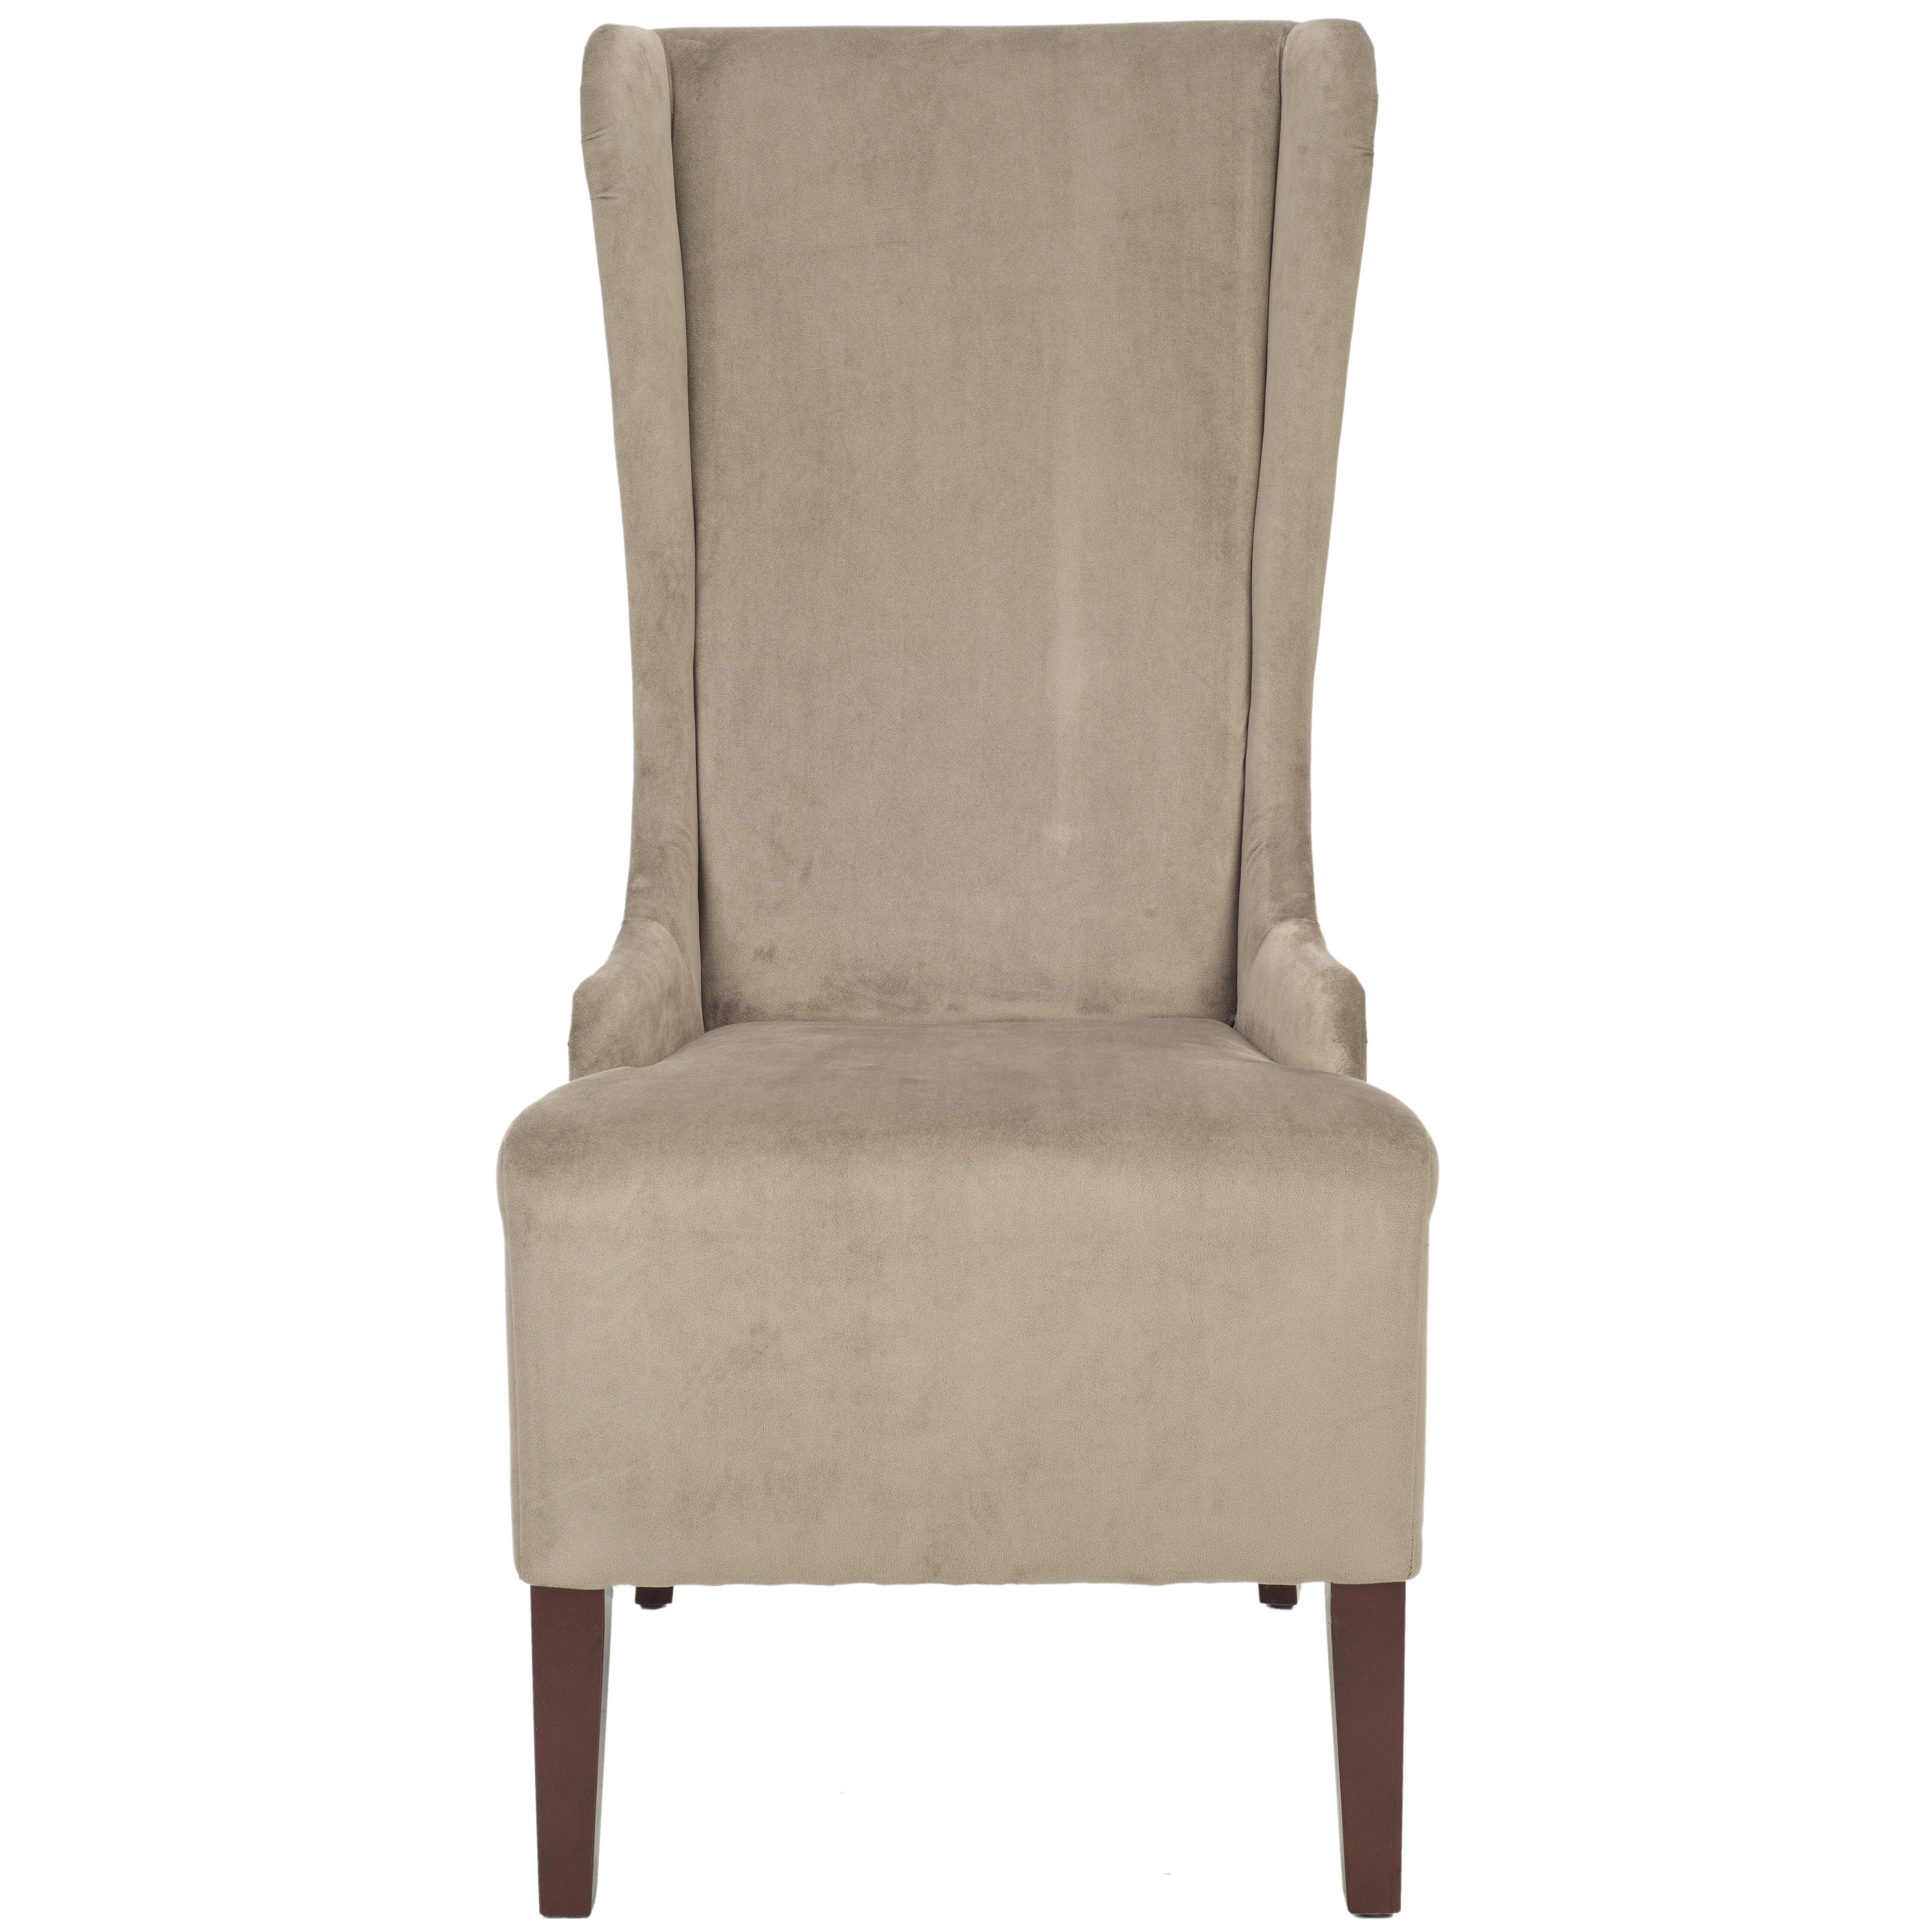 Safavieh Oliva Cotton Parson Chair amp Reviews Wayfair : Safavieh Oliva Cotton Parson Chair from www.wayfair.com size 5166 x 5166 jpeg 2709kB